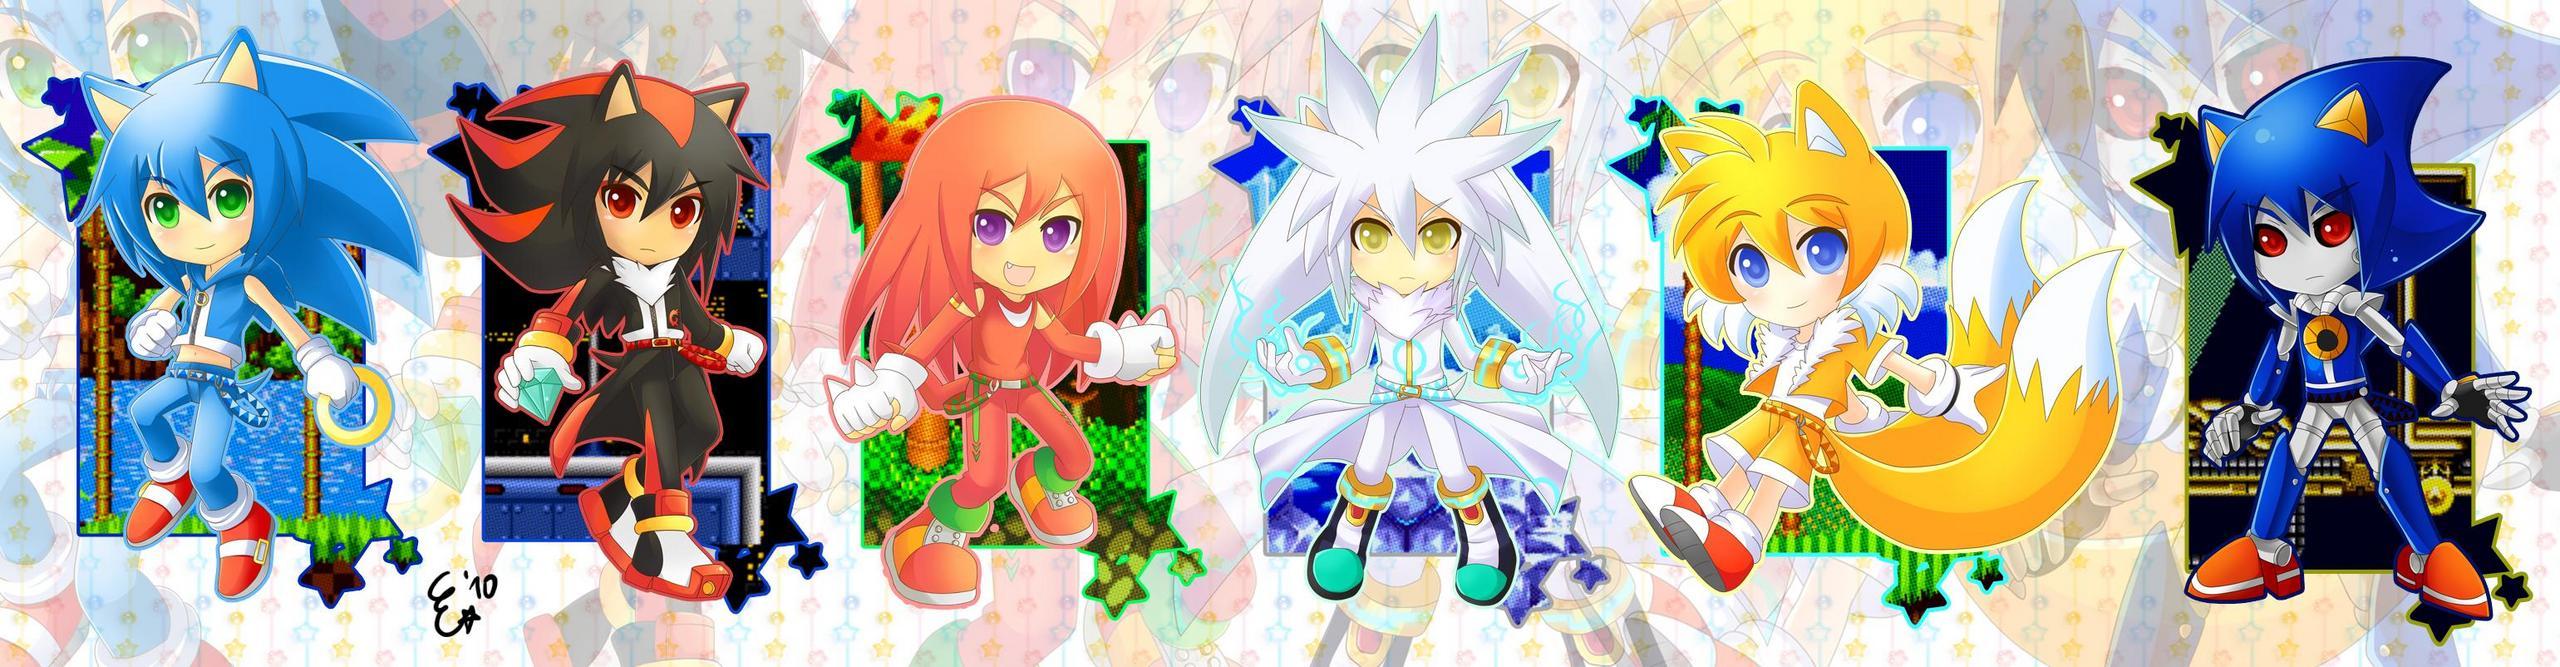 Human Sonic And Co Sonic The Hedgehog Fan Art 30595881 Fanpop